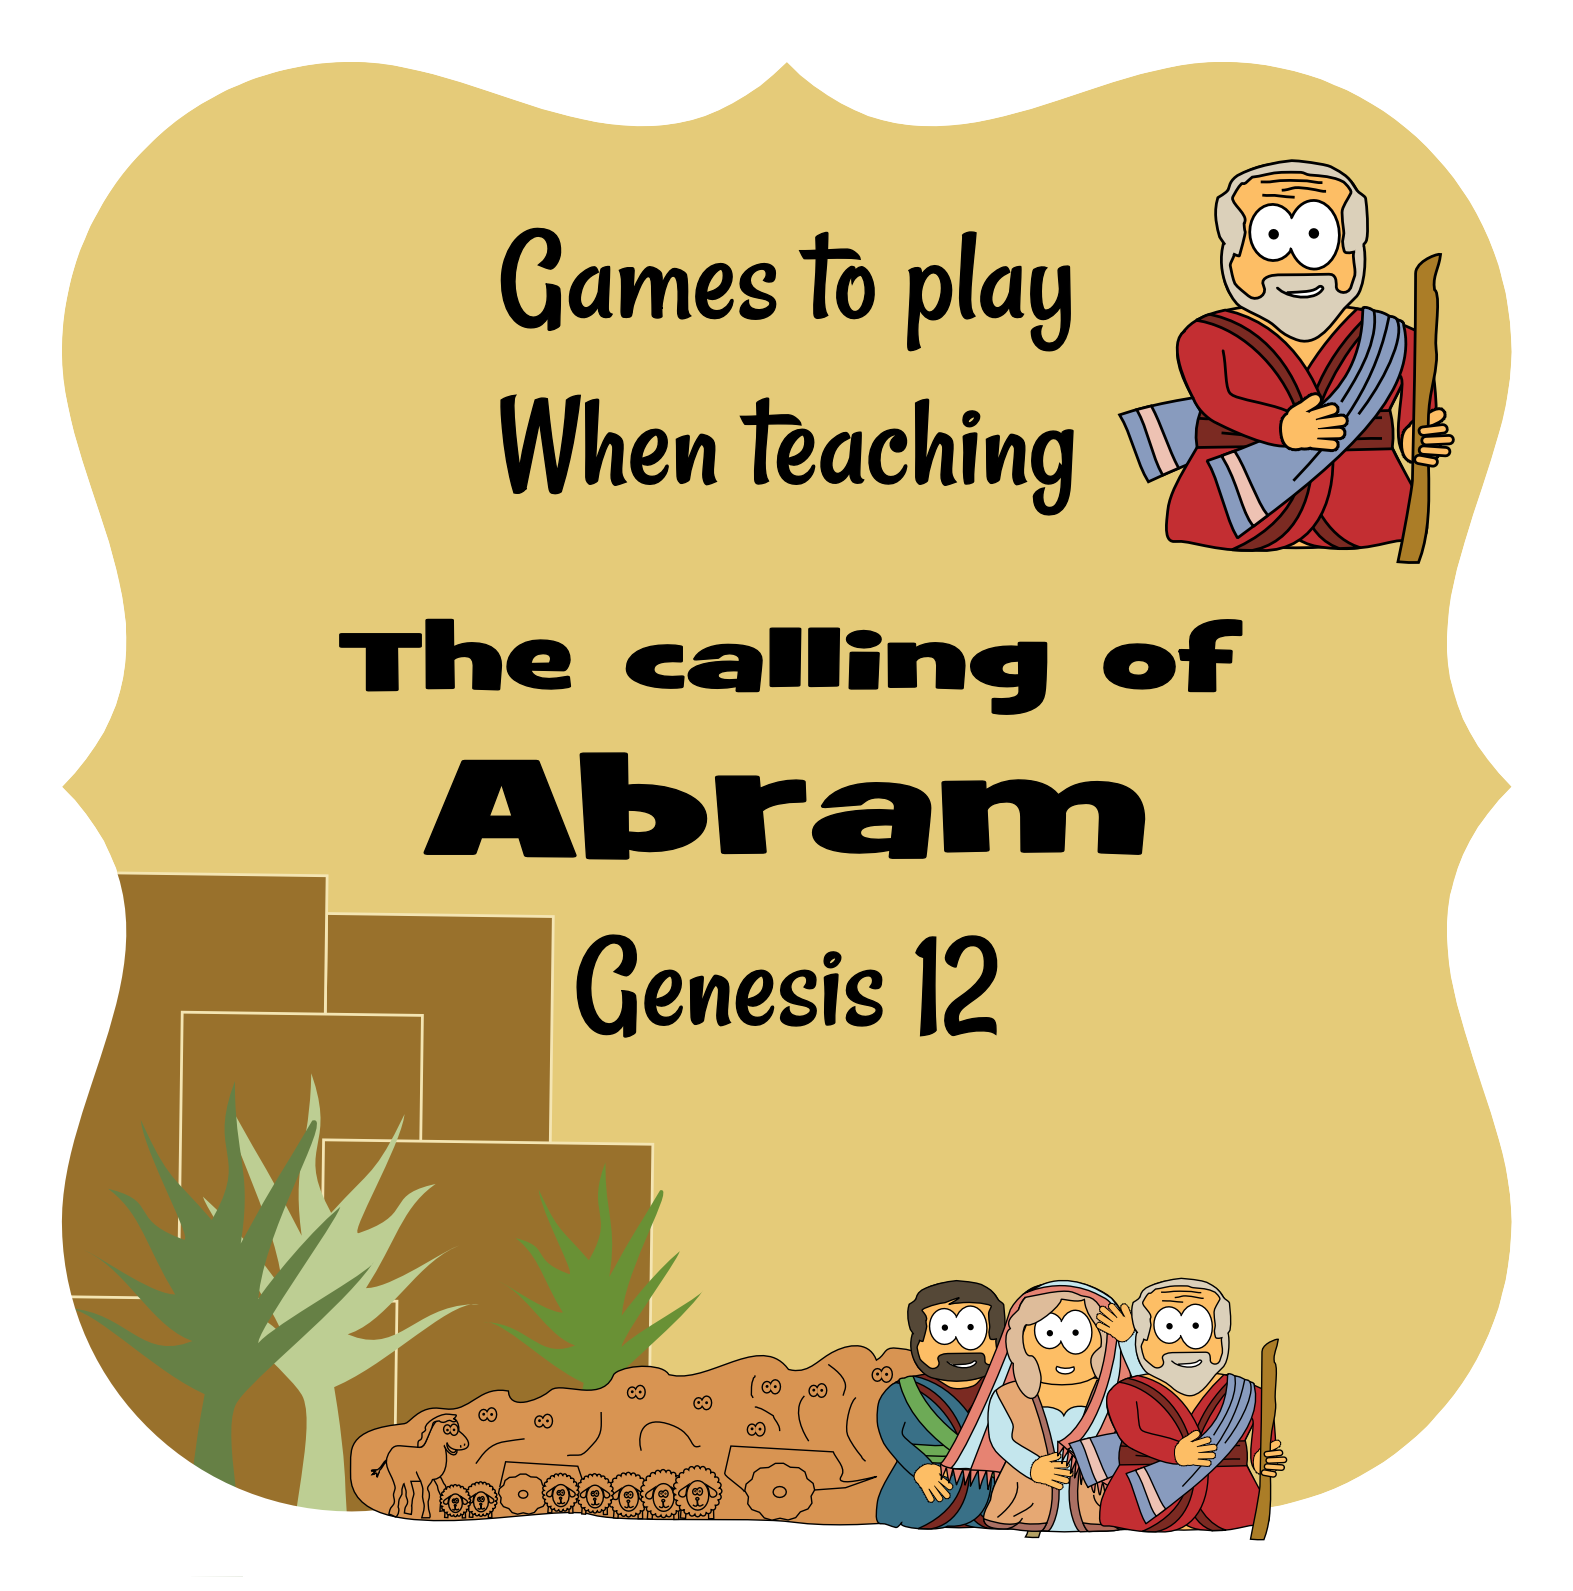 Abram Genesis 12